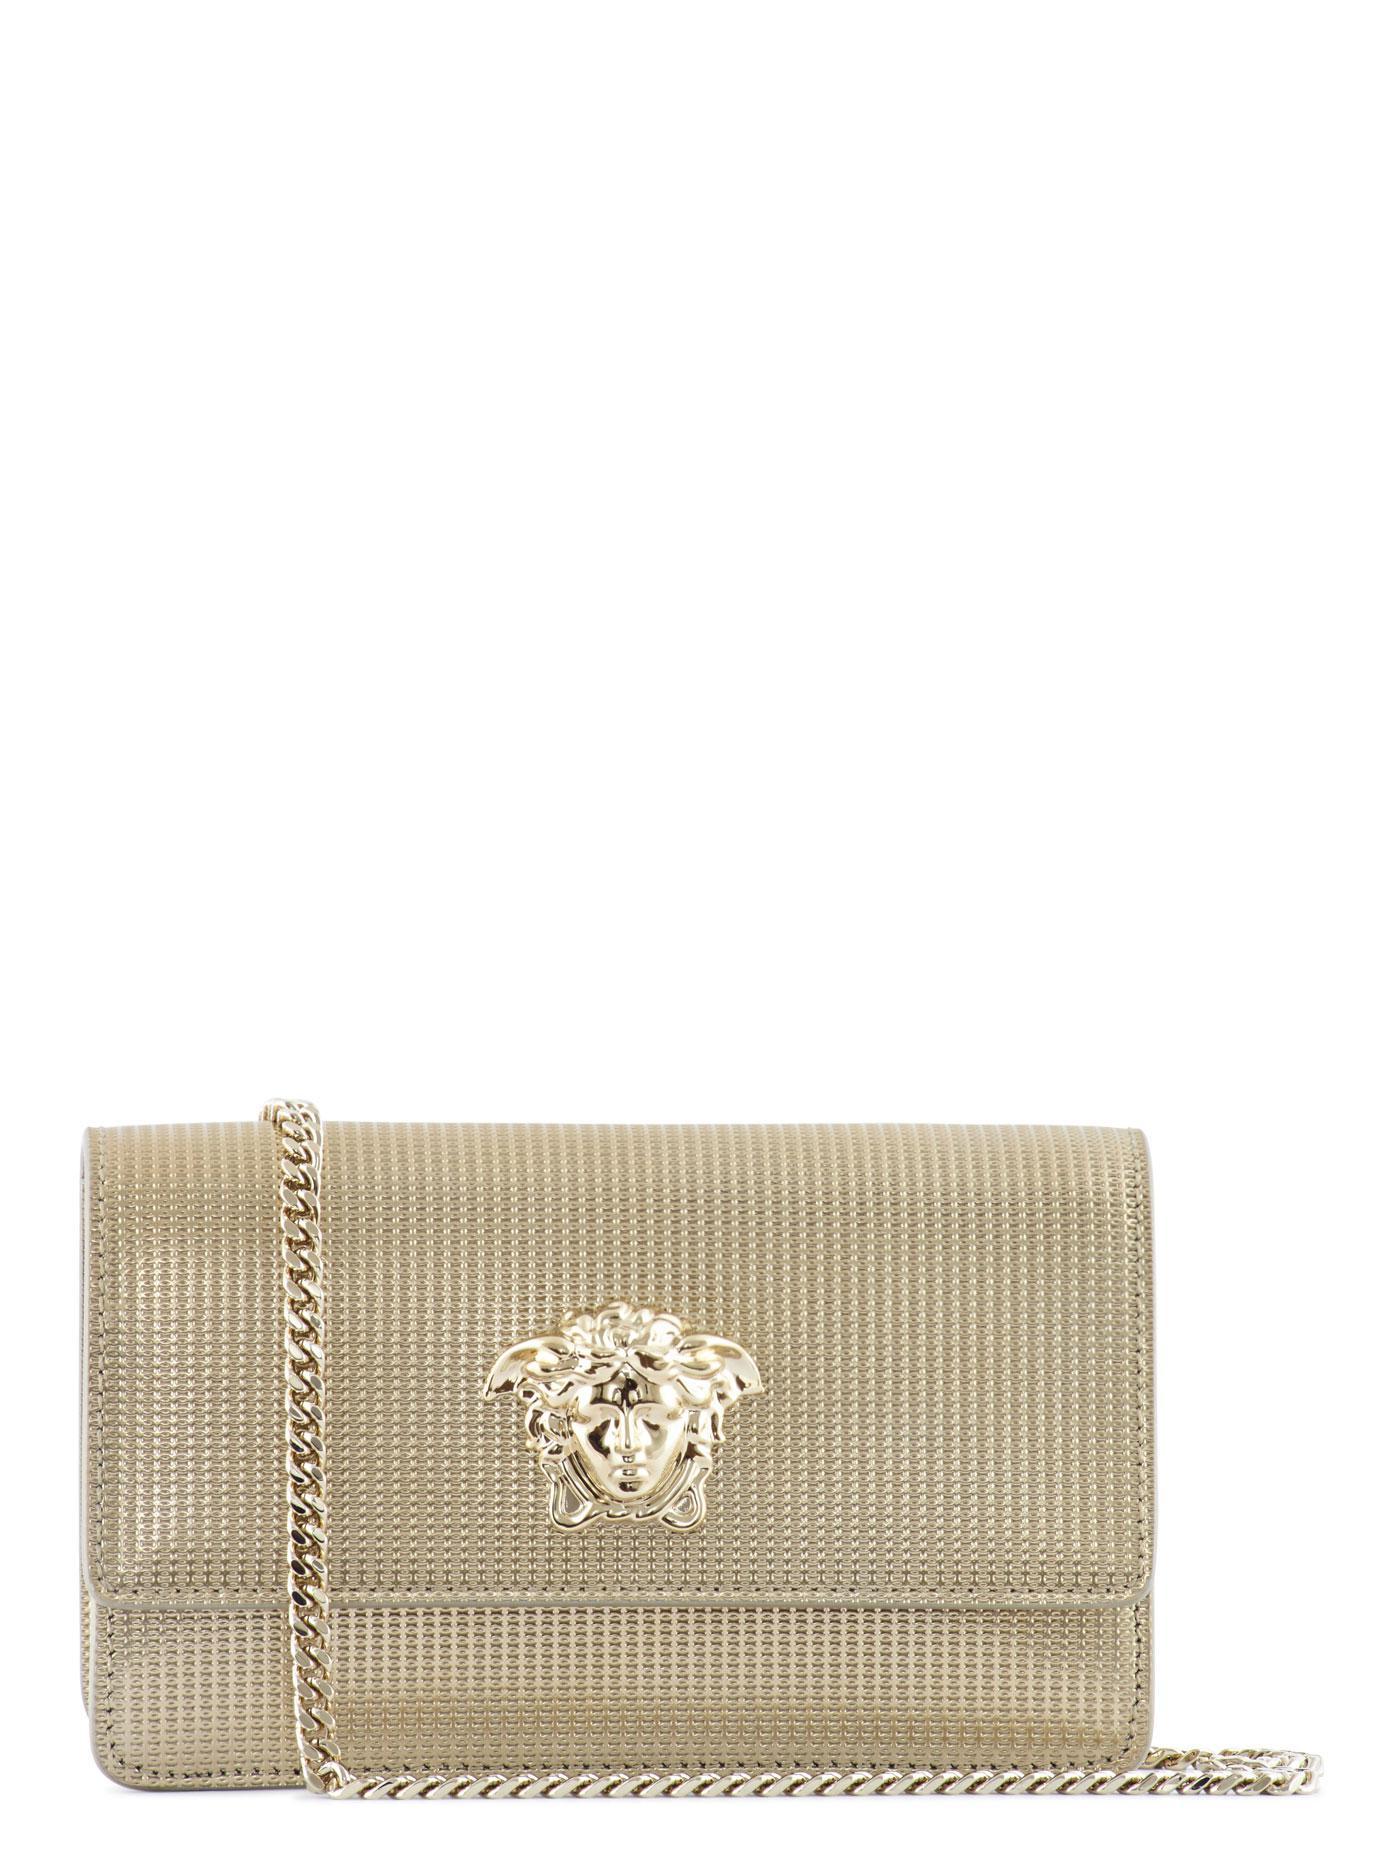 3d358e400bfb Versace Palazzo Medusa Crossbody Bag in Metallic - Lyst